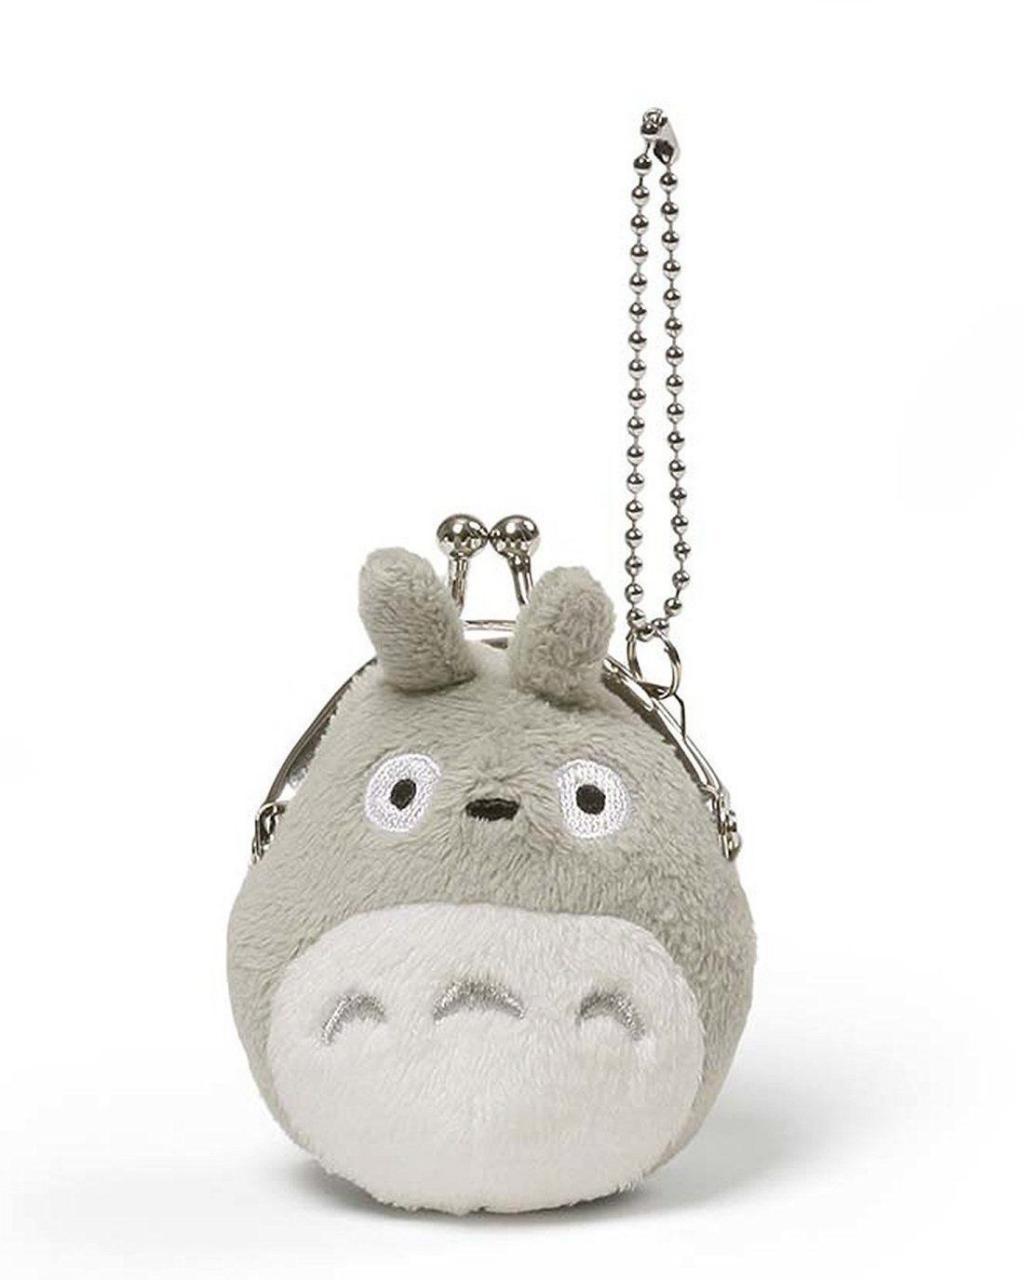 STUDIO GHIBLI - Porte-Monnaie Peluche Mini Totoro - 8 cm